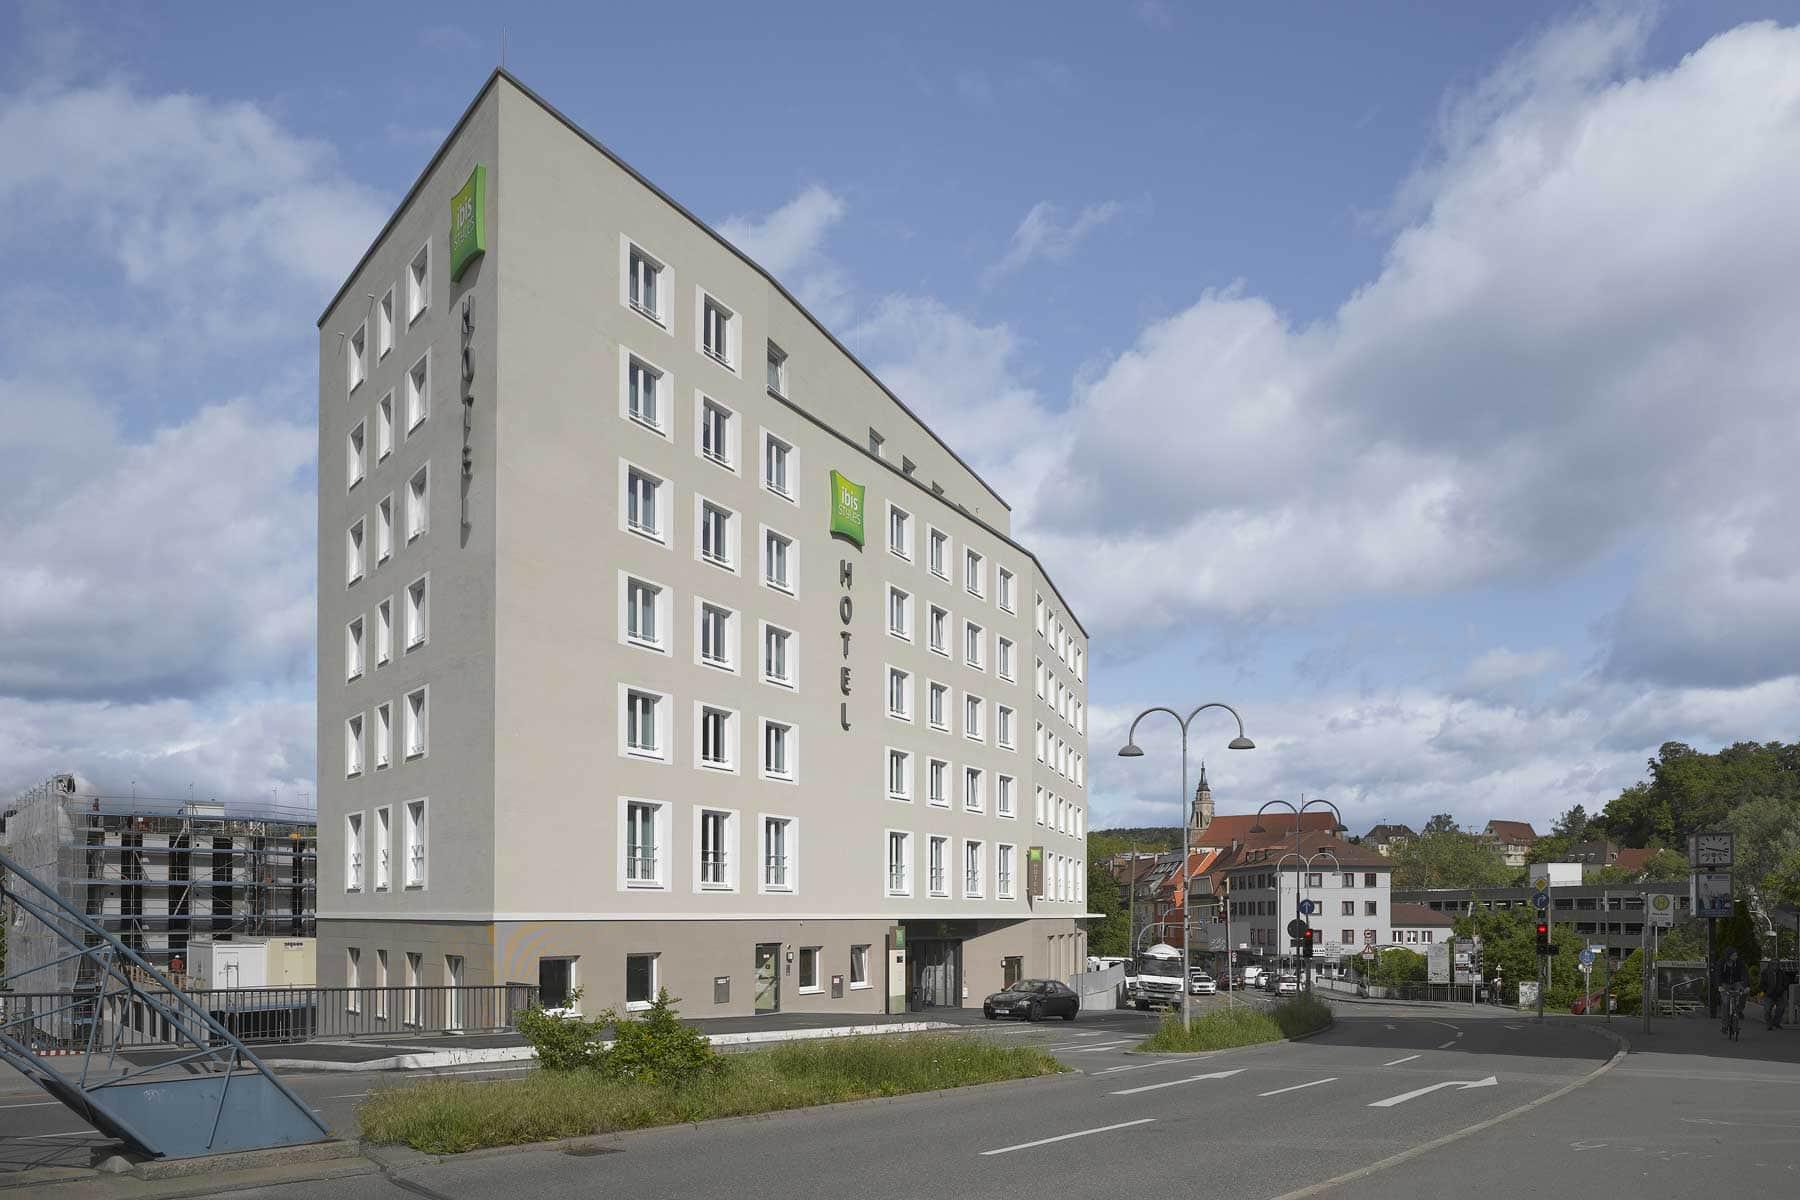 Ibis Hotel Am Blauen Turm, Tübingen